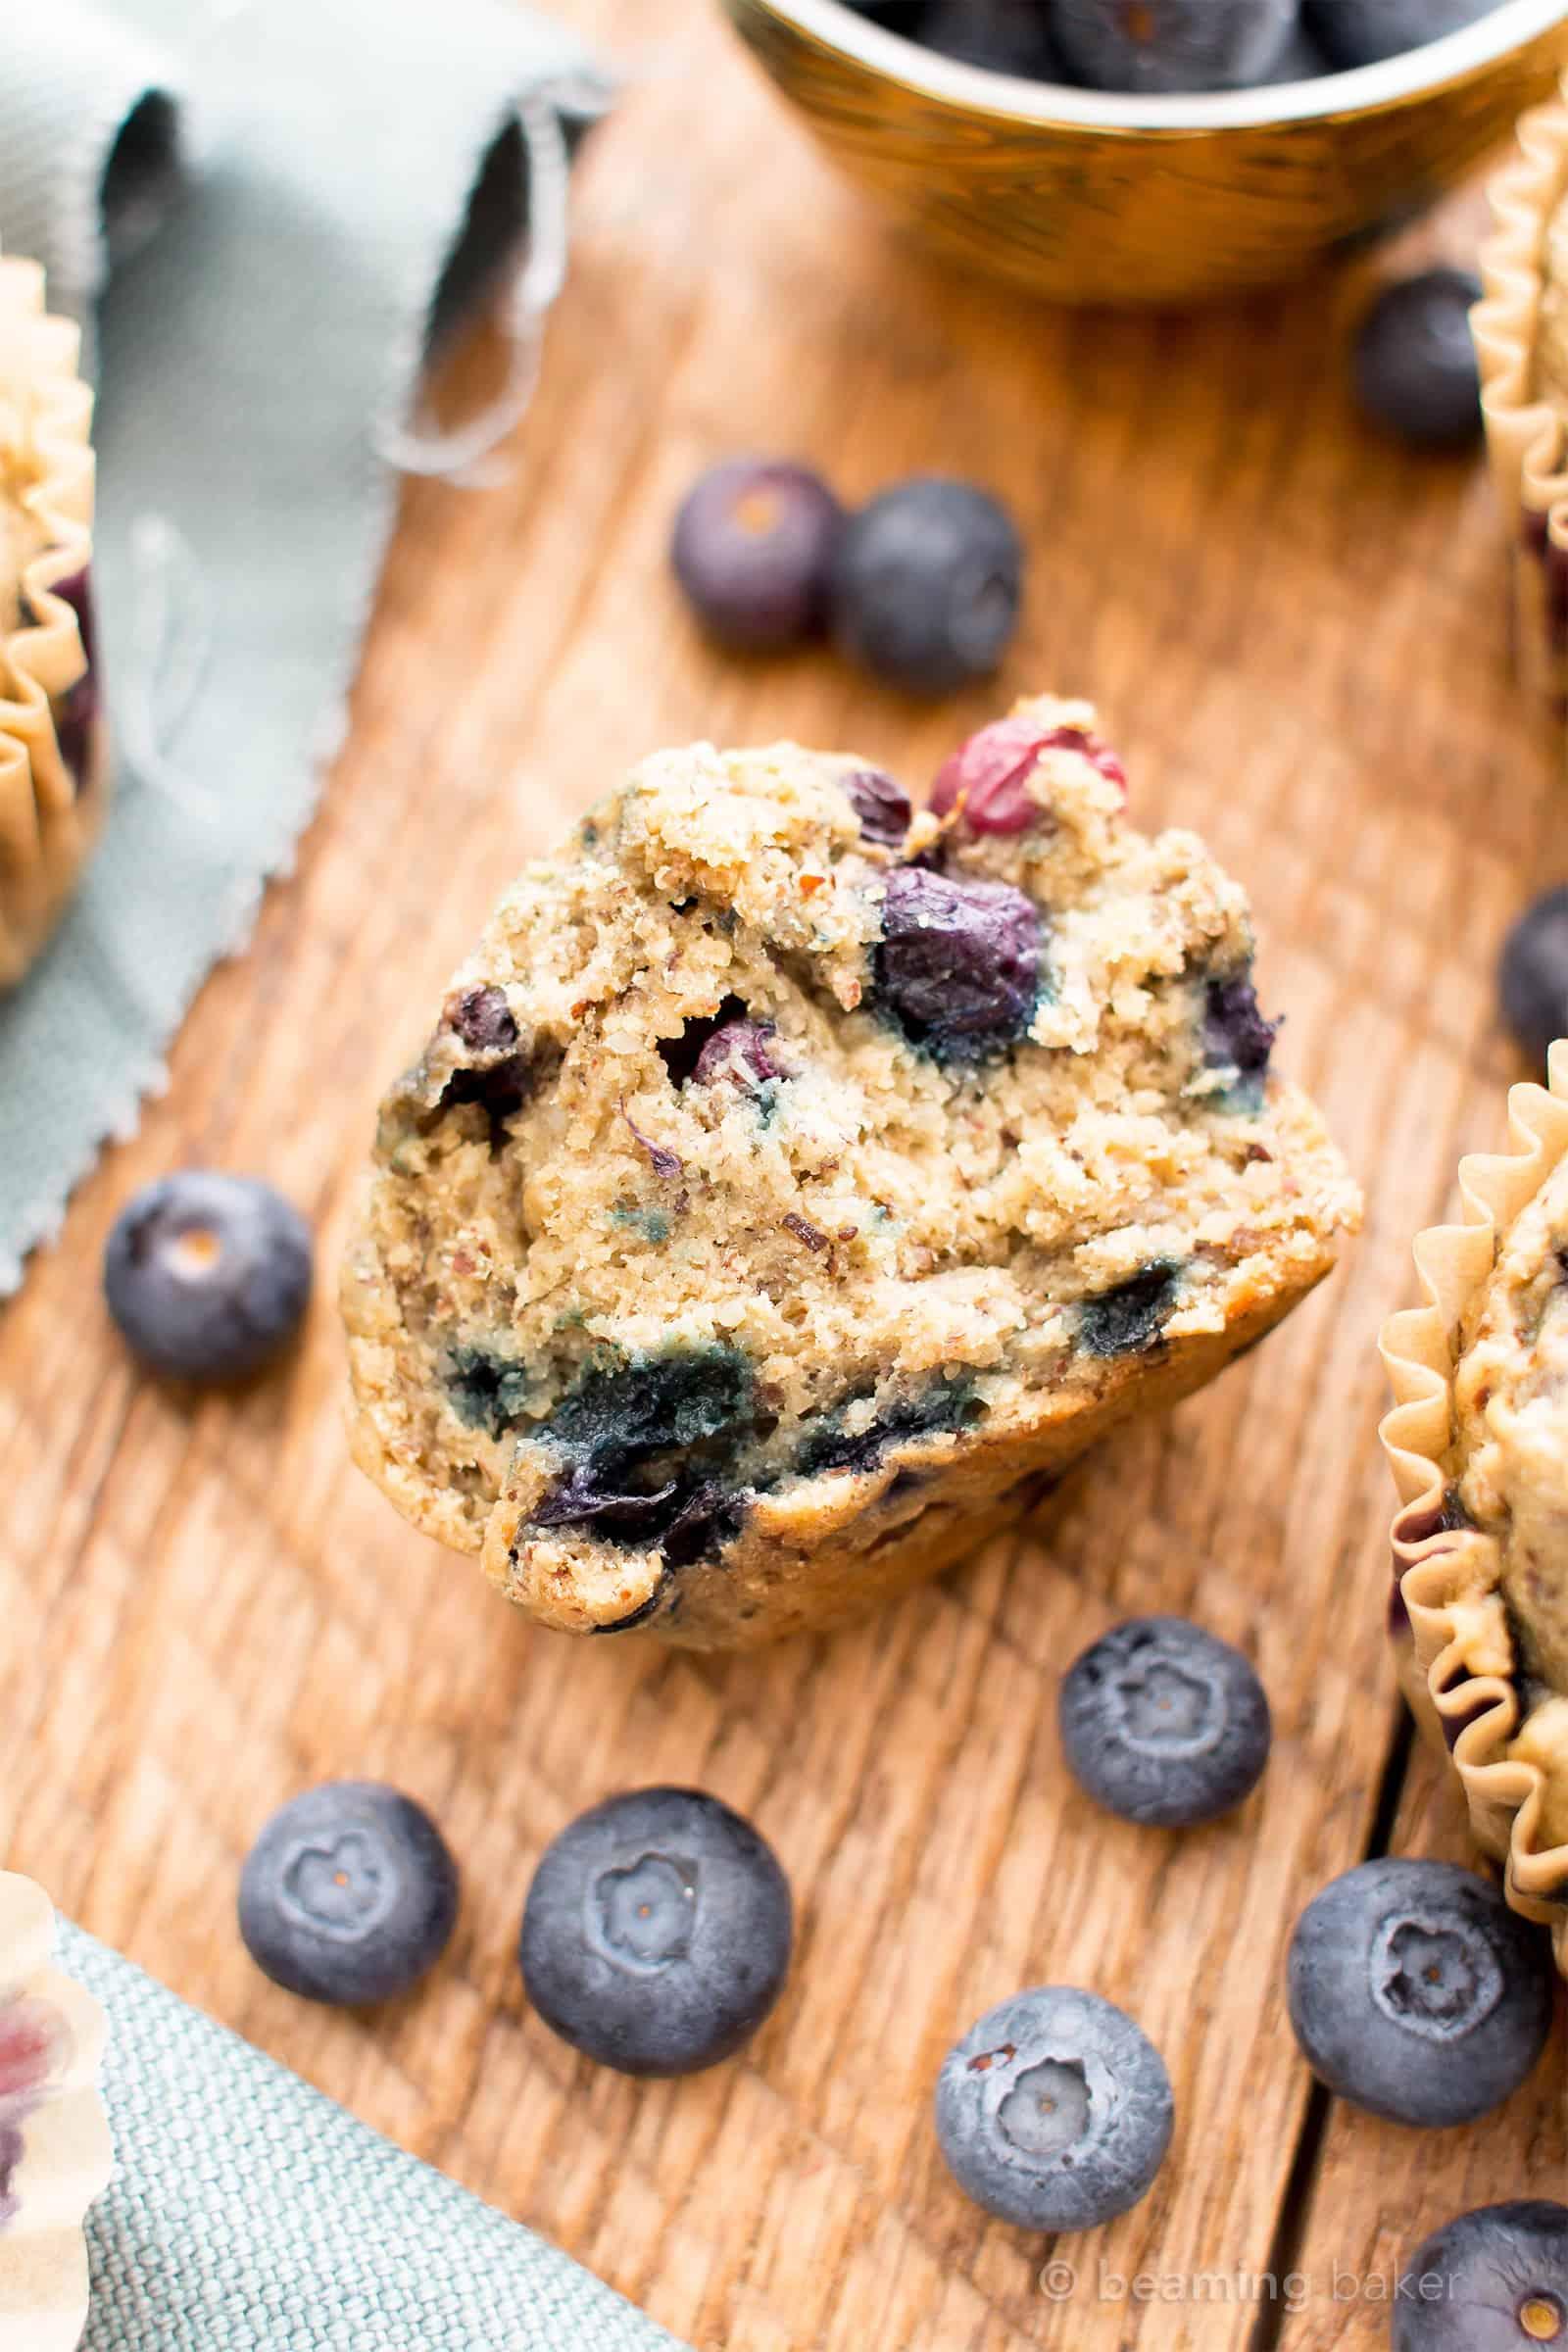 Healthy Banana Blueberry Muffins Recipe (V, GF): an easy recipe for moist banana muffins bursting with fresh blueberry flavor! #Vegan #GlutenFree #DairyFree #Breakfast #Healthy   Recipe on BeamingBaker.com